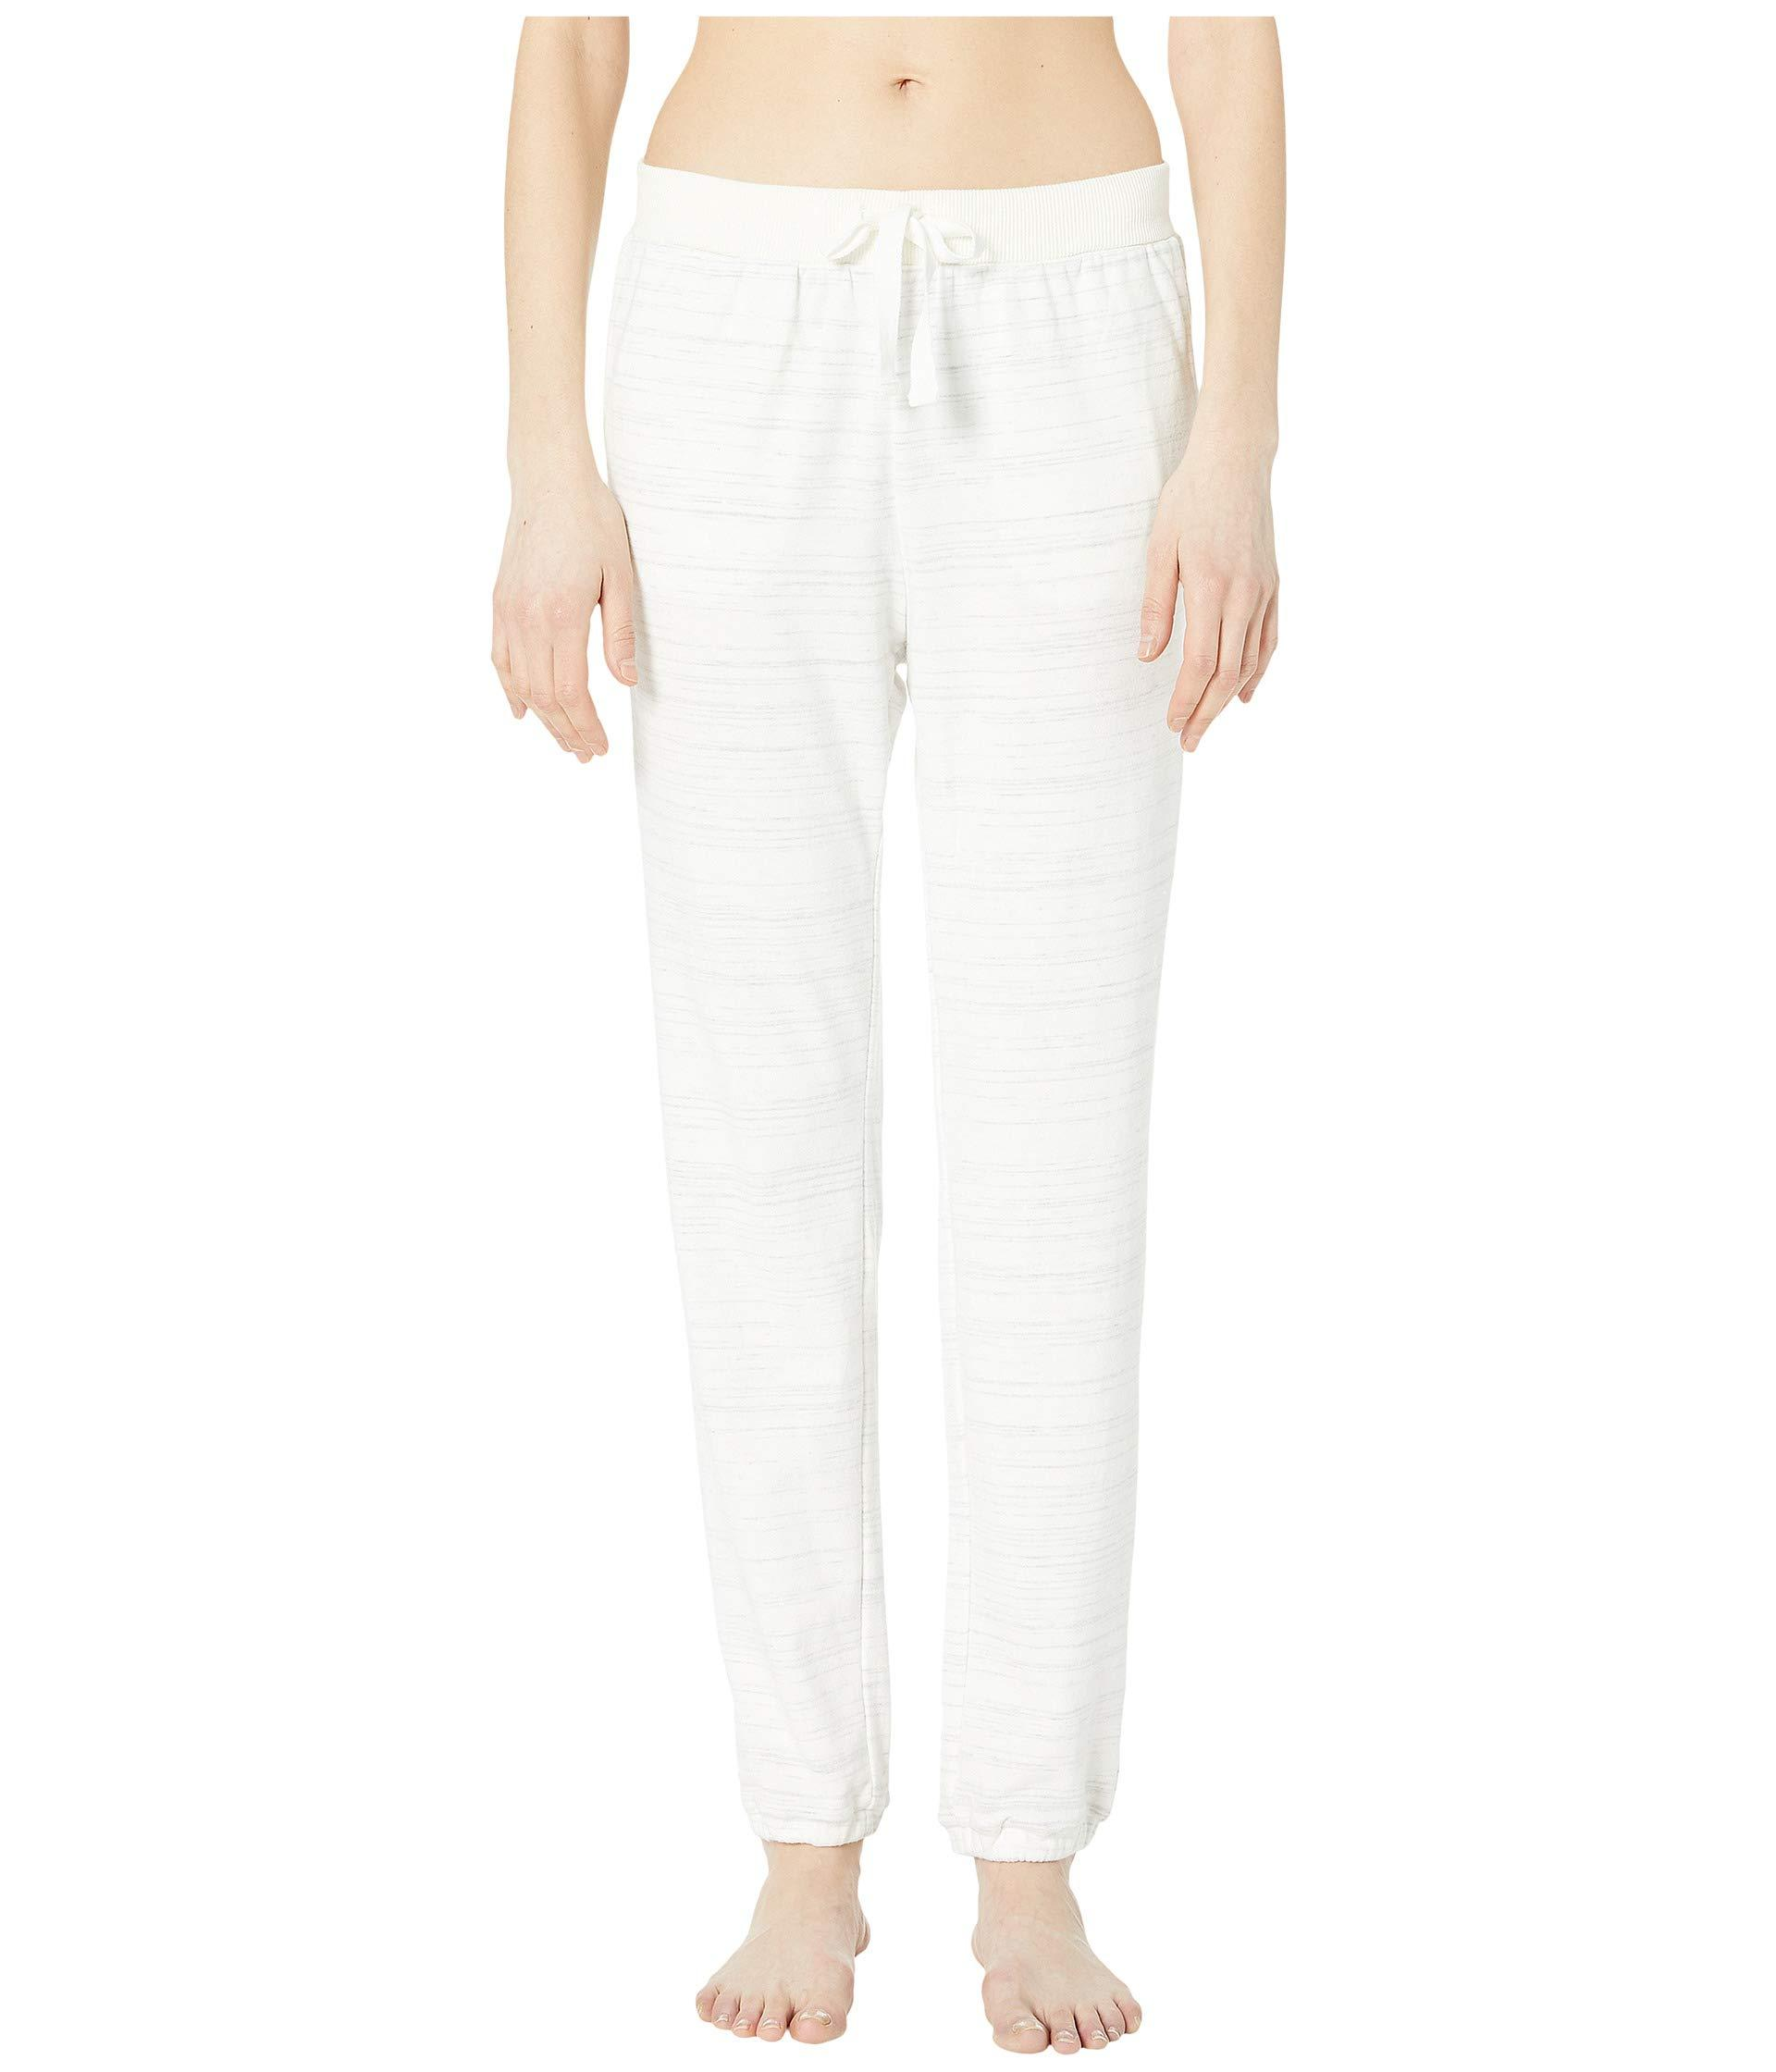 752fbcf373 Lyst - Skin Taylor Pants (ivory/grey Heather) Women's Pajama in Gray